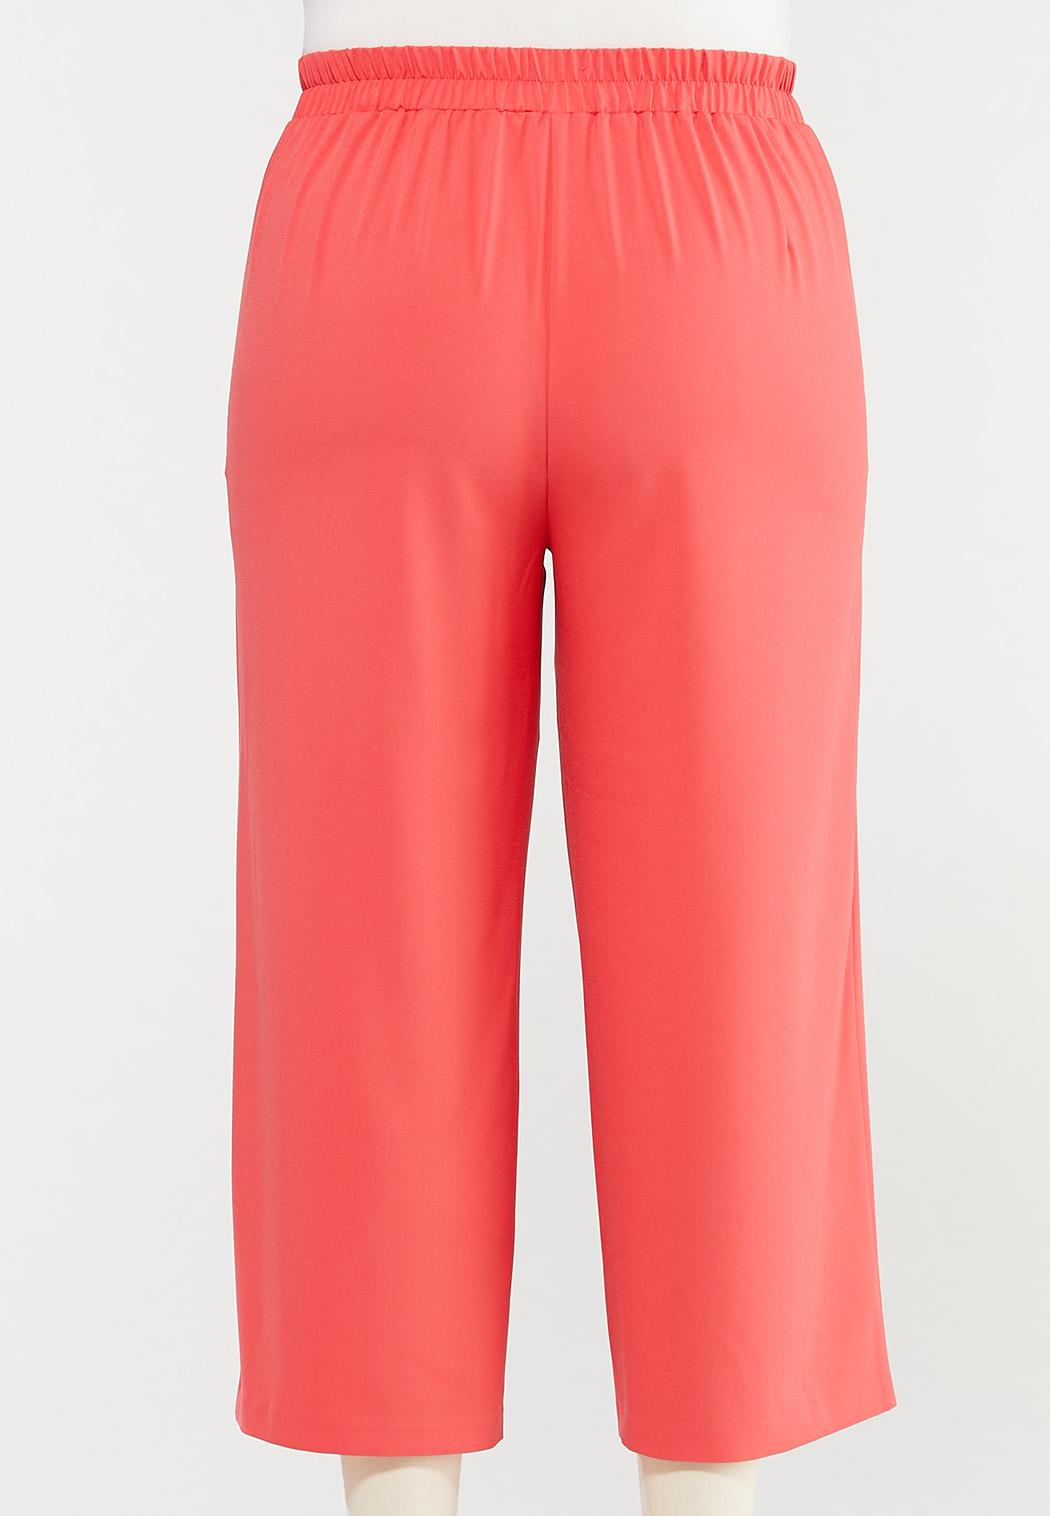 Plus Size Cropped Spice Wide Leg Pants (Item #44476602)